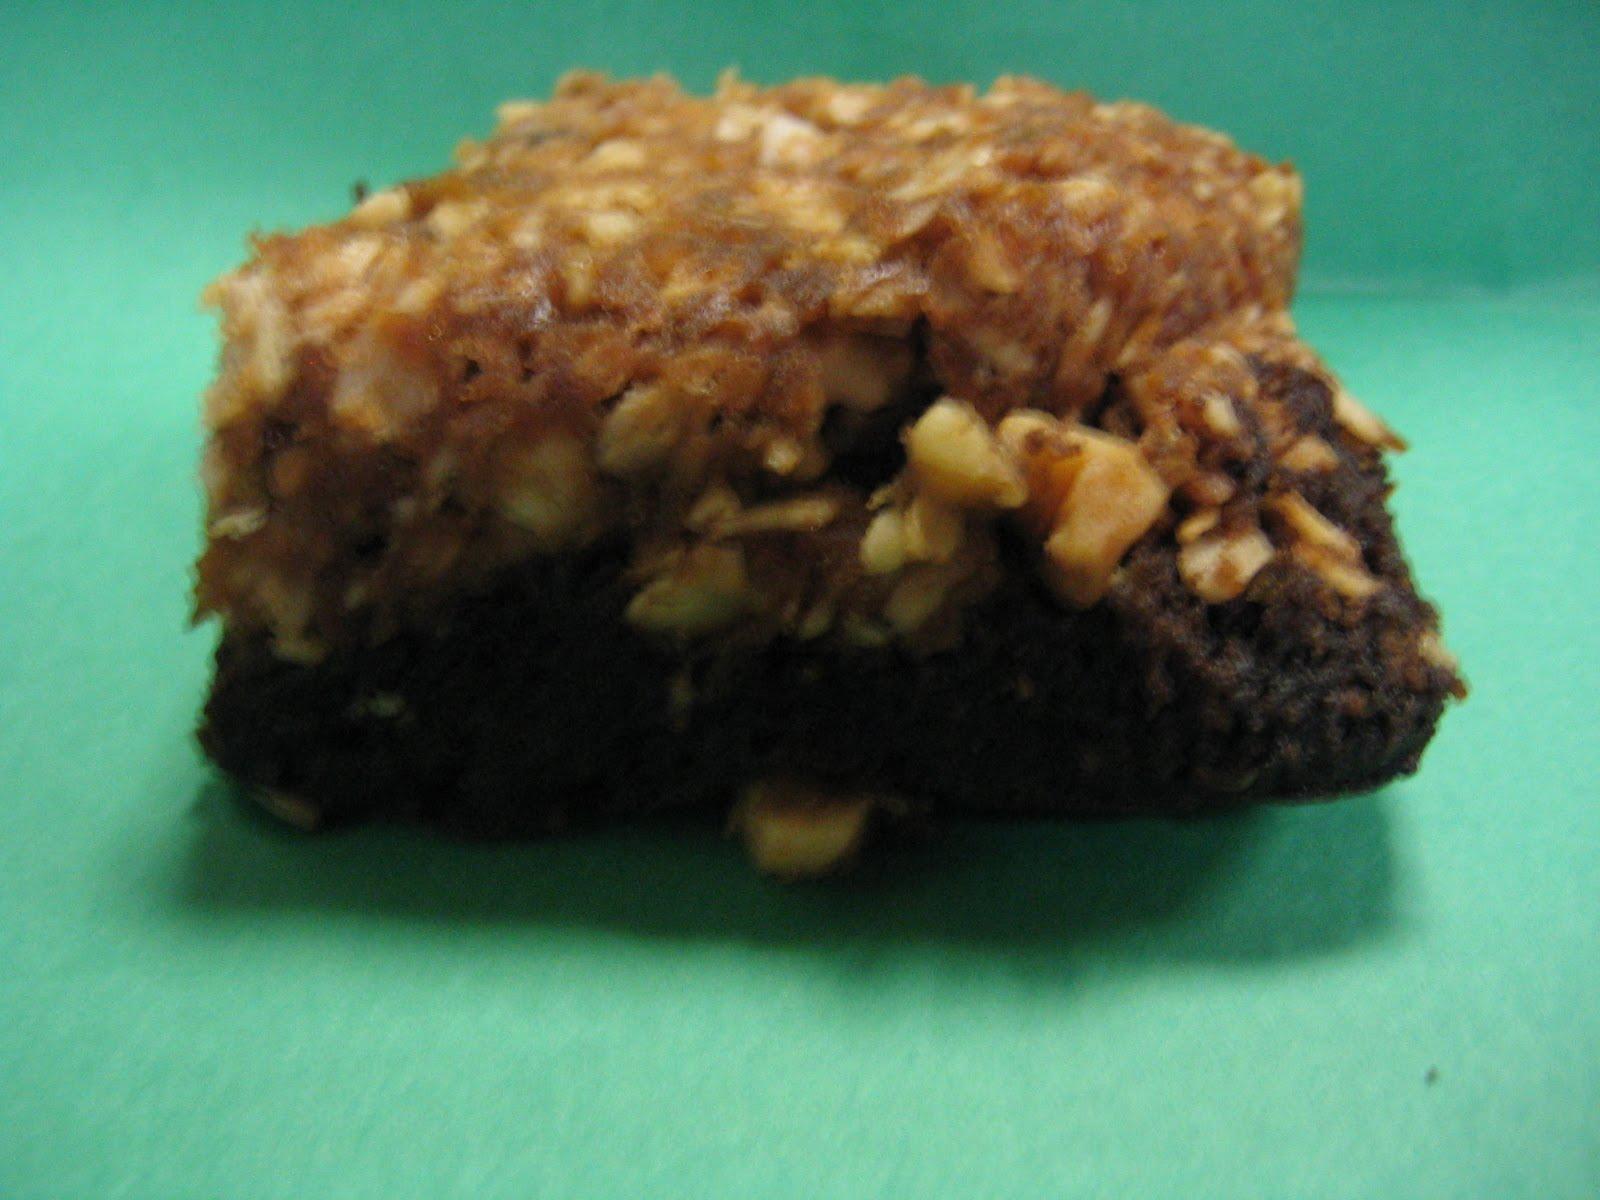 Betty Crocker Cooky Challenge: UPSIDEDOWN BROWNIES